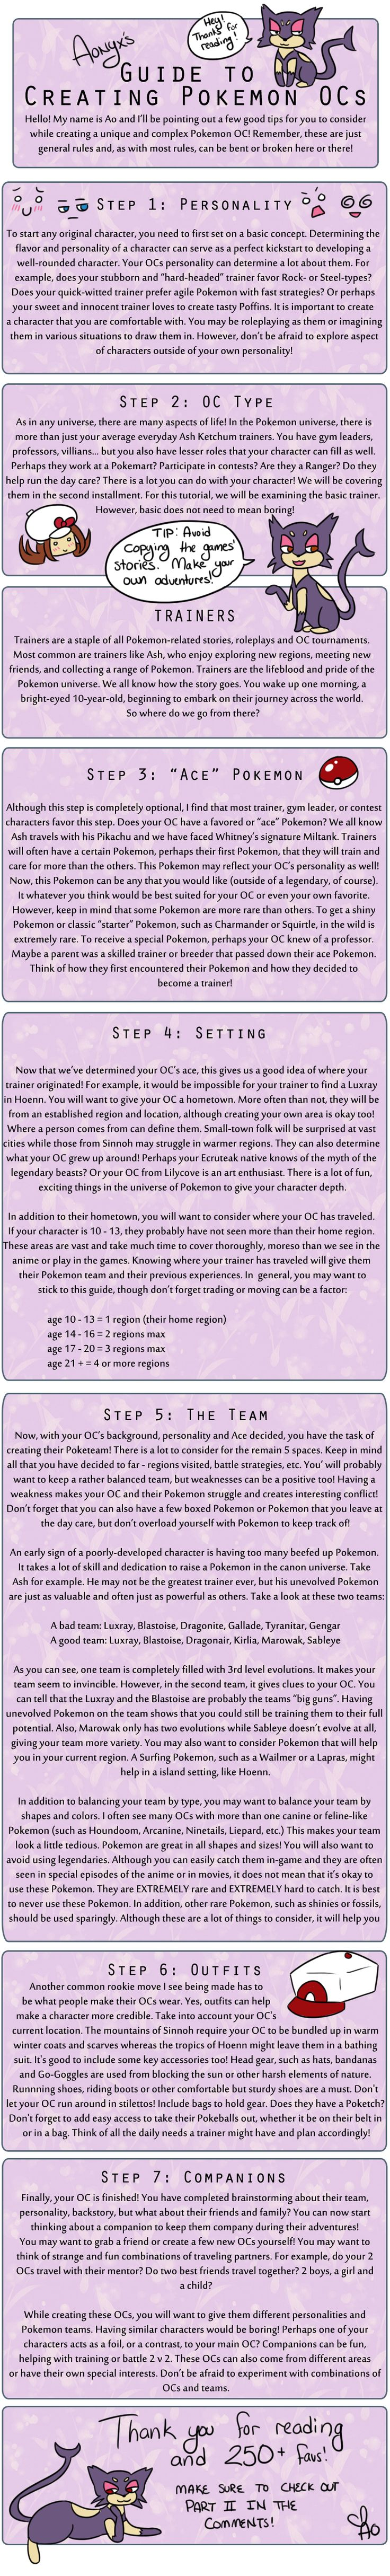 UPDATED+Pokemon+Trainer+OC+Tutorial.+by+Aonyx.deviantart.com+on+@deviantART